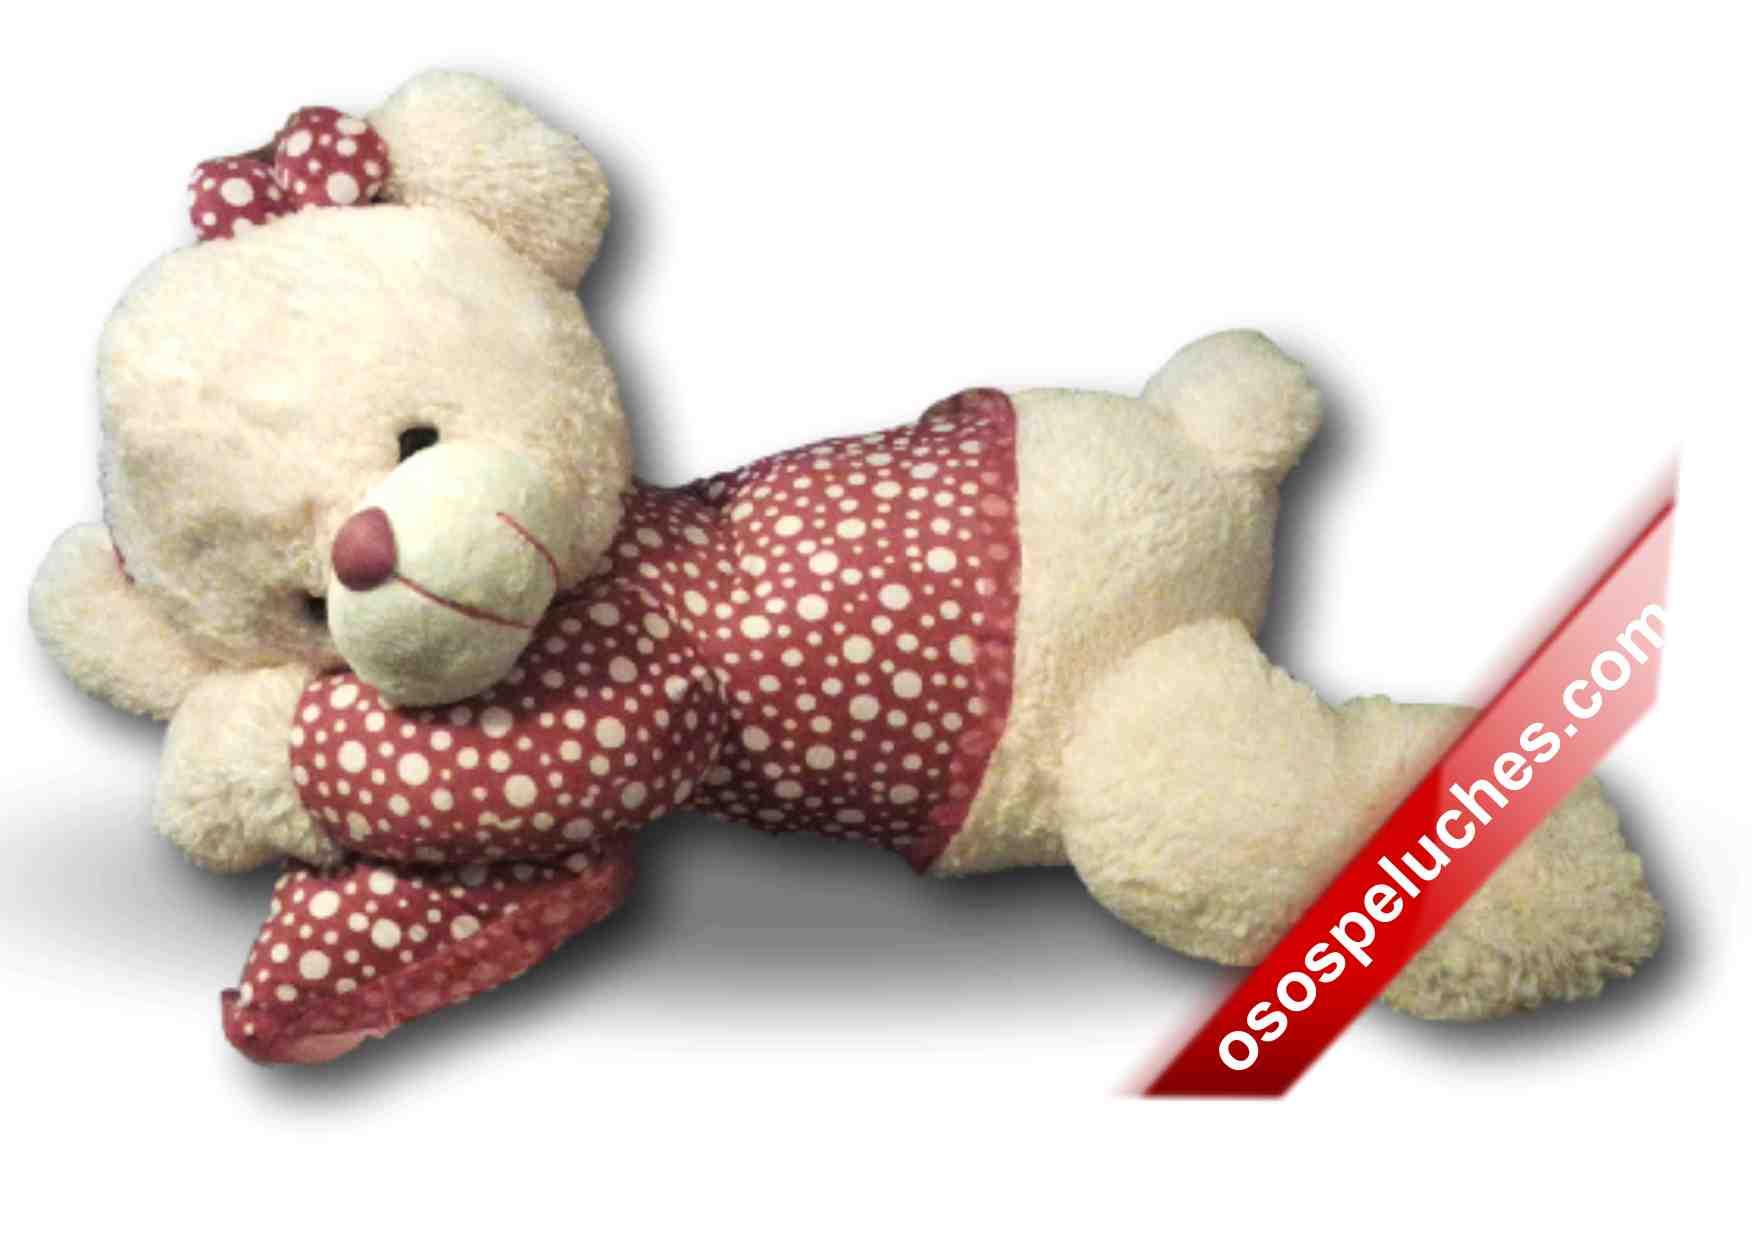 Imagen de Dormilona de peluche 1m sentada roja con punt